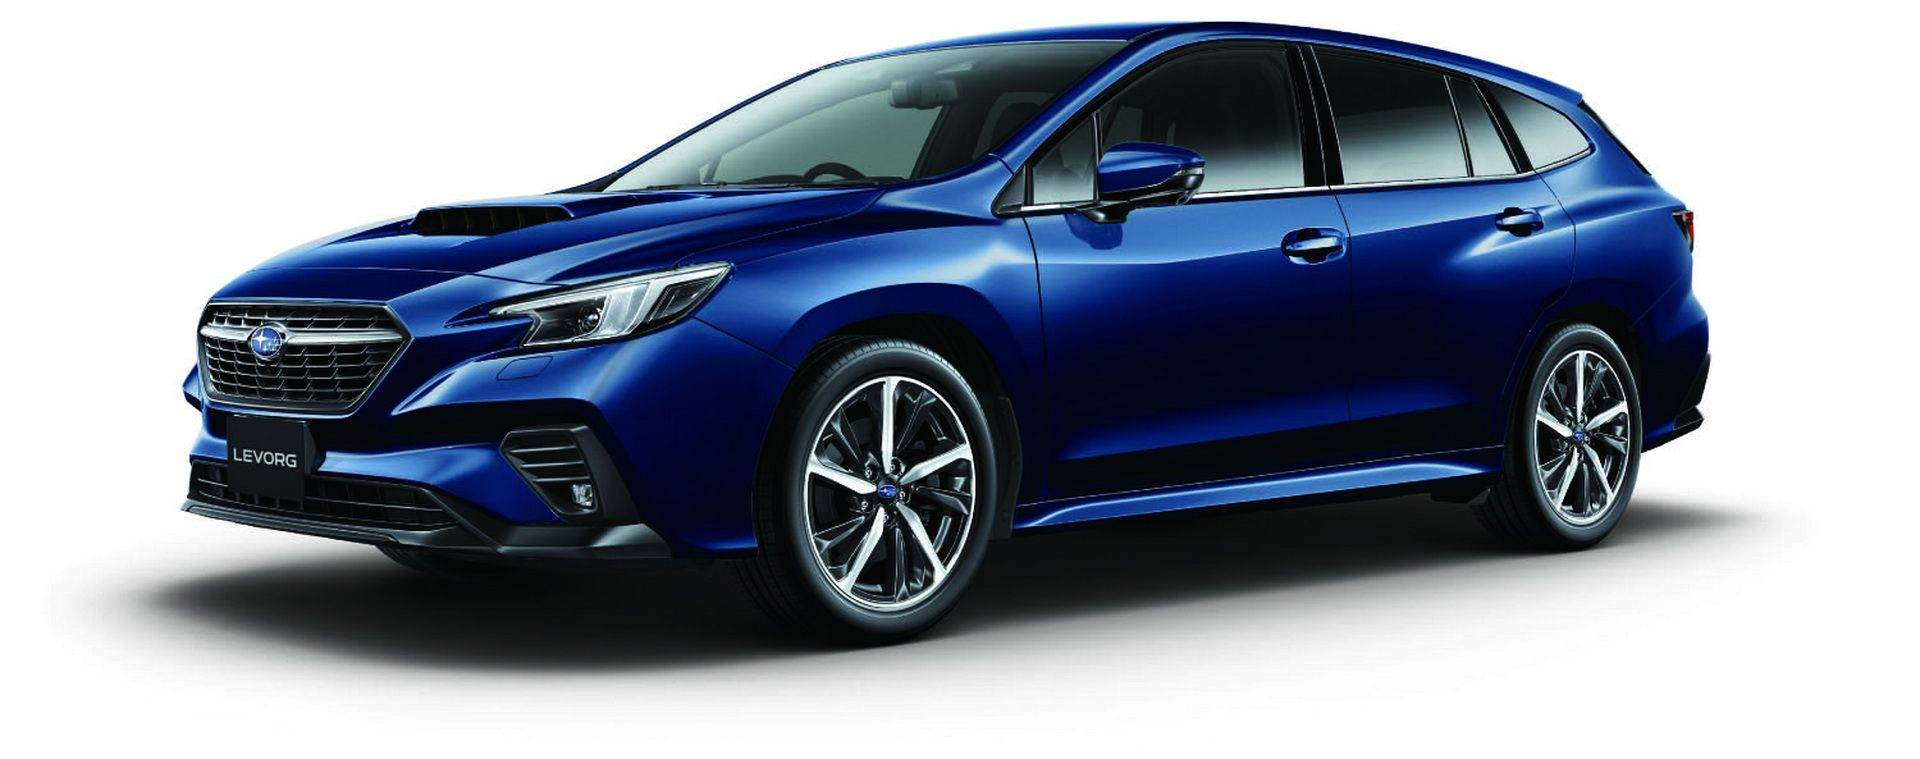 2021_Subaru_Levorg_0103